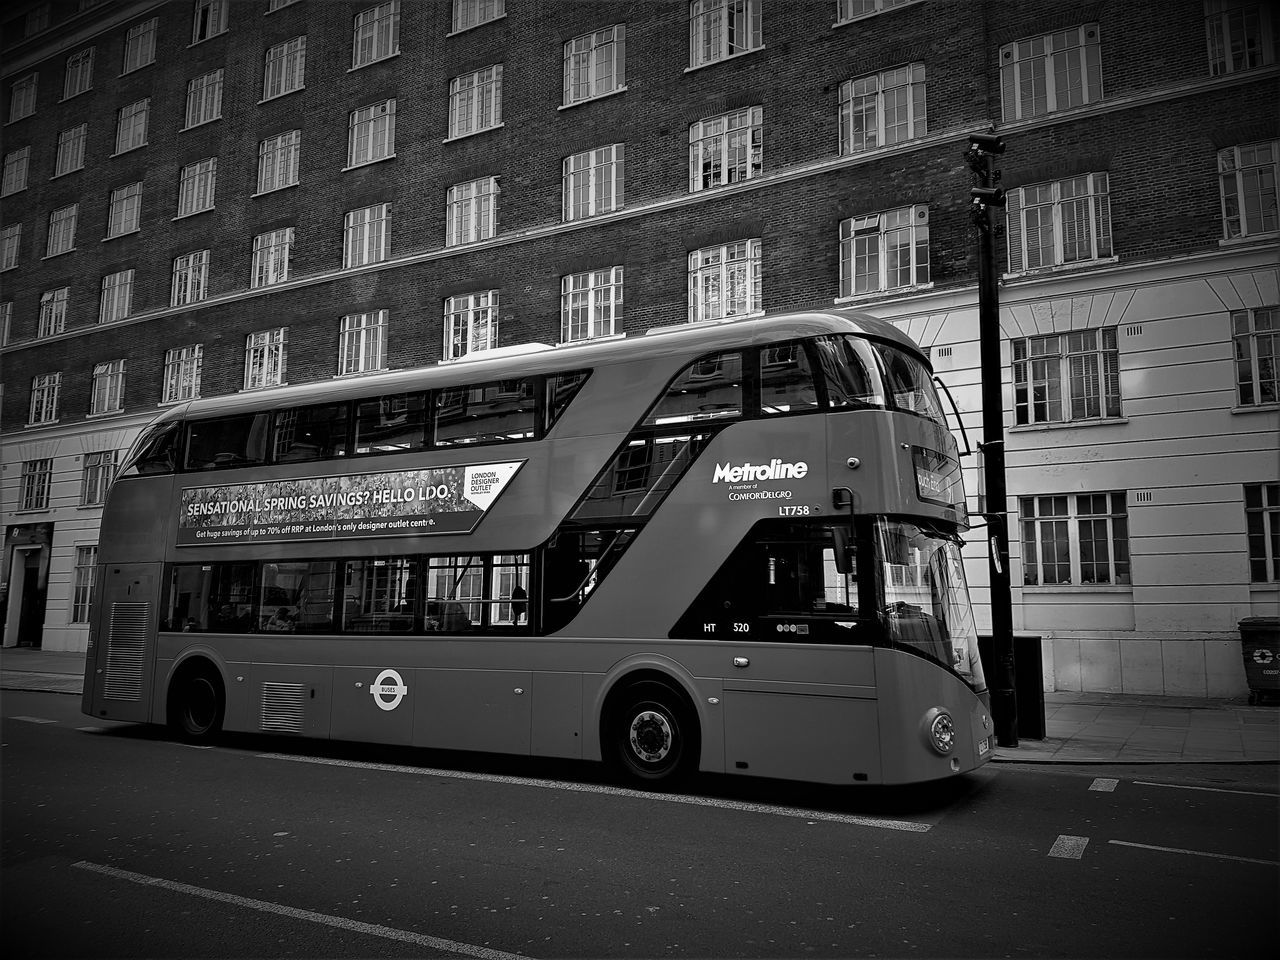 Architecture Black Black & White City Land Vehicle London London Bus London Buses Mode Of Transport Outdoors Road Transport Transportation